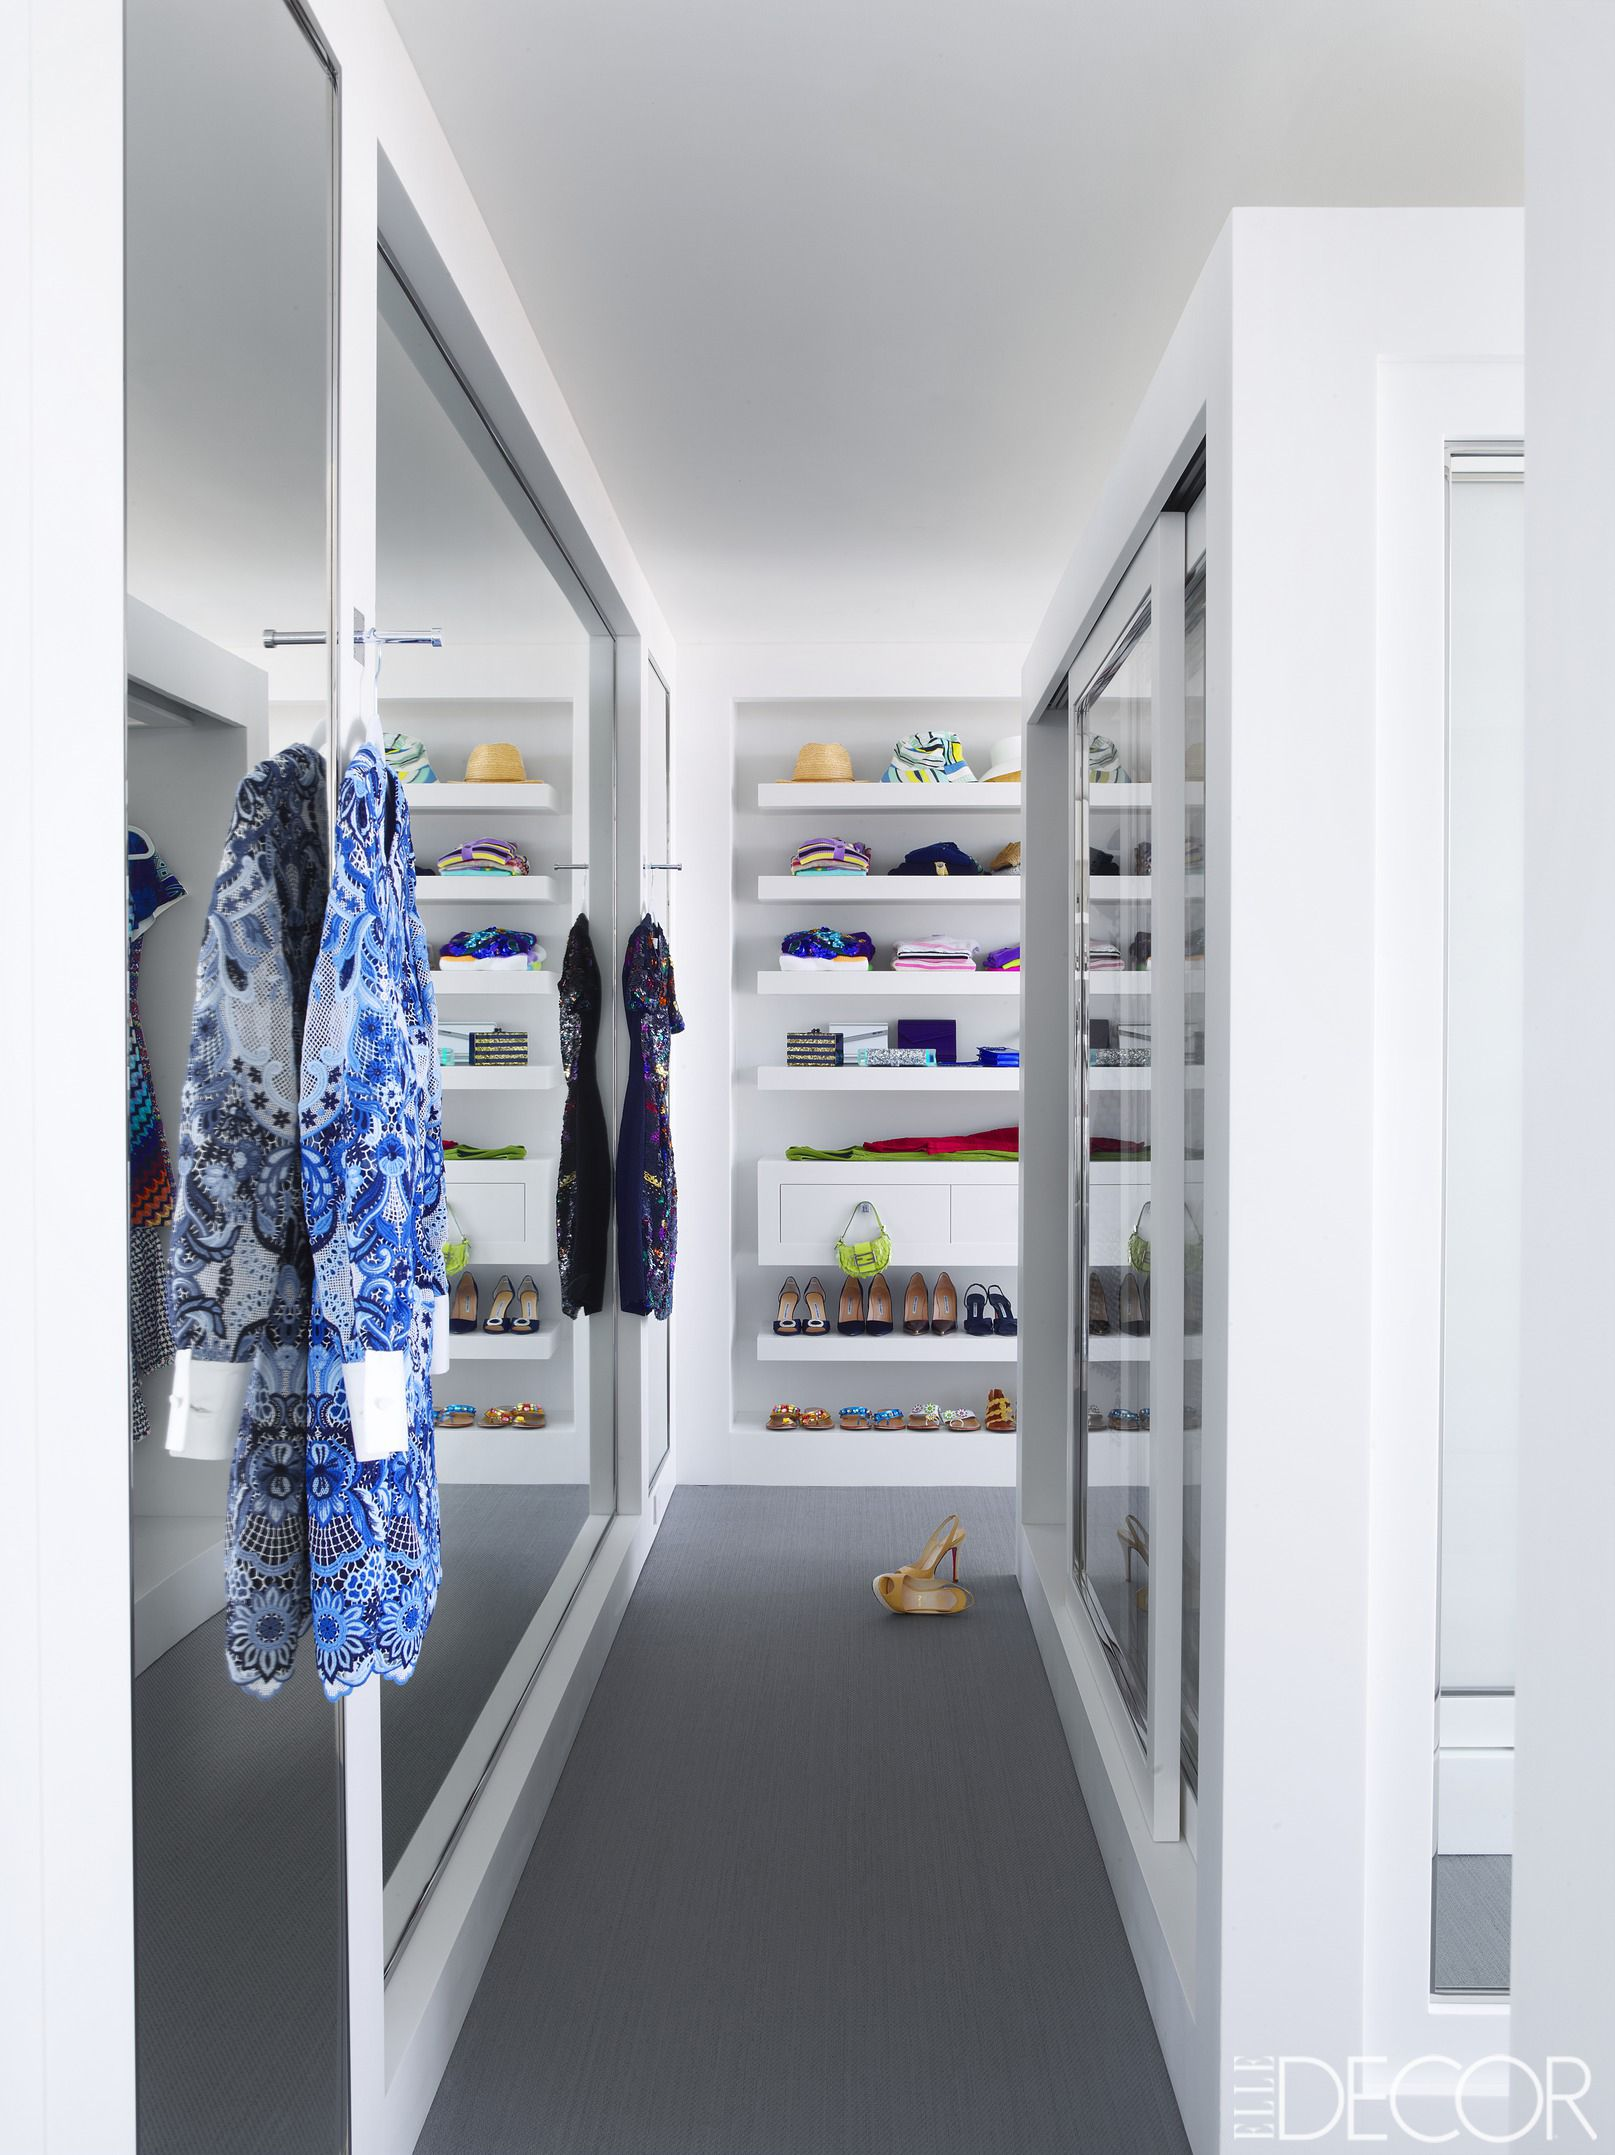 House Tour Inside An Artfully Daring Florida Home Closet Designs Wardrobe Design Wardrobe Room